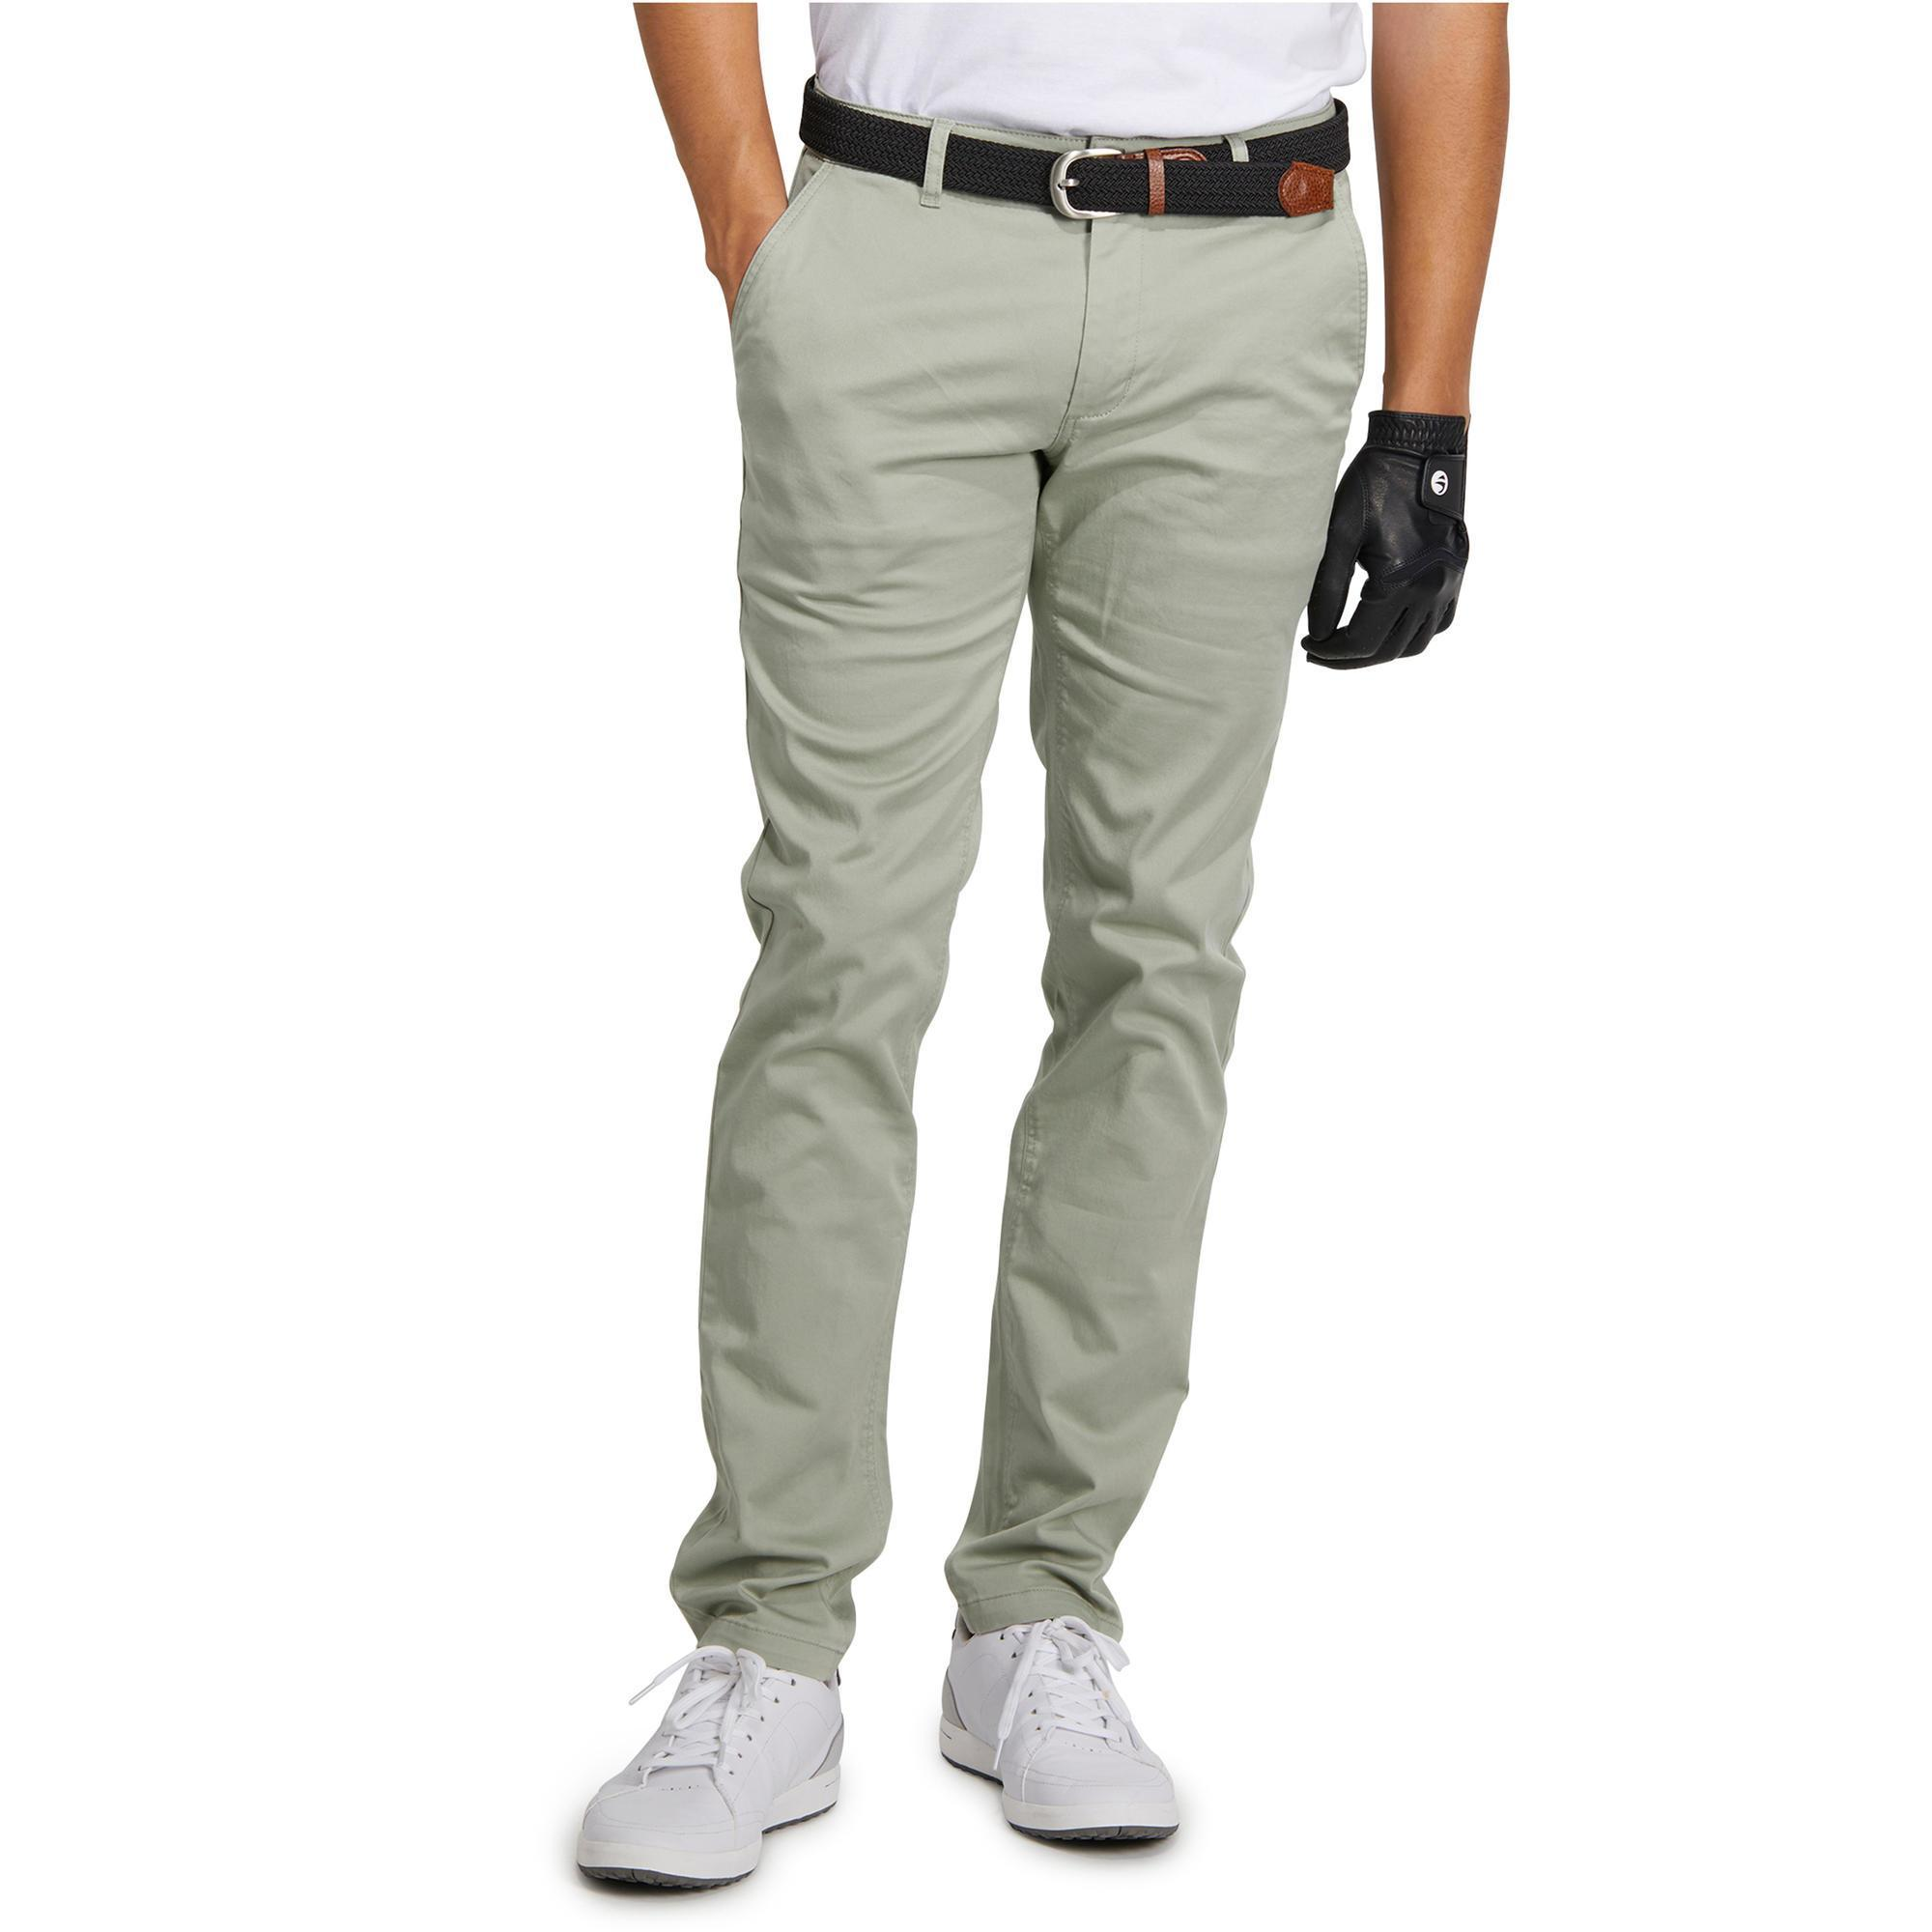 pantalon golf homme 500 vert clair inesis golf. Black Bedroom Furniture Sets. Home Design Ideas